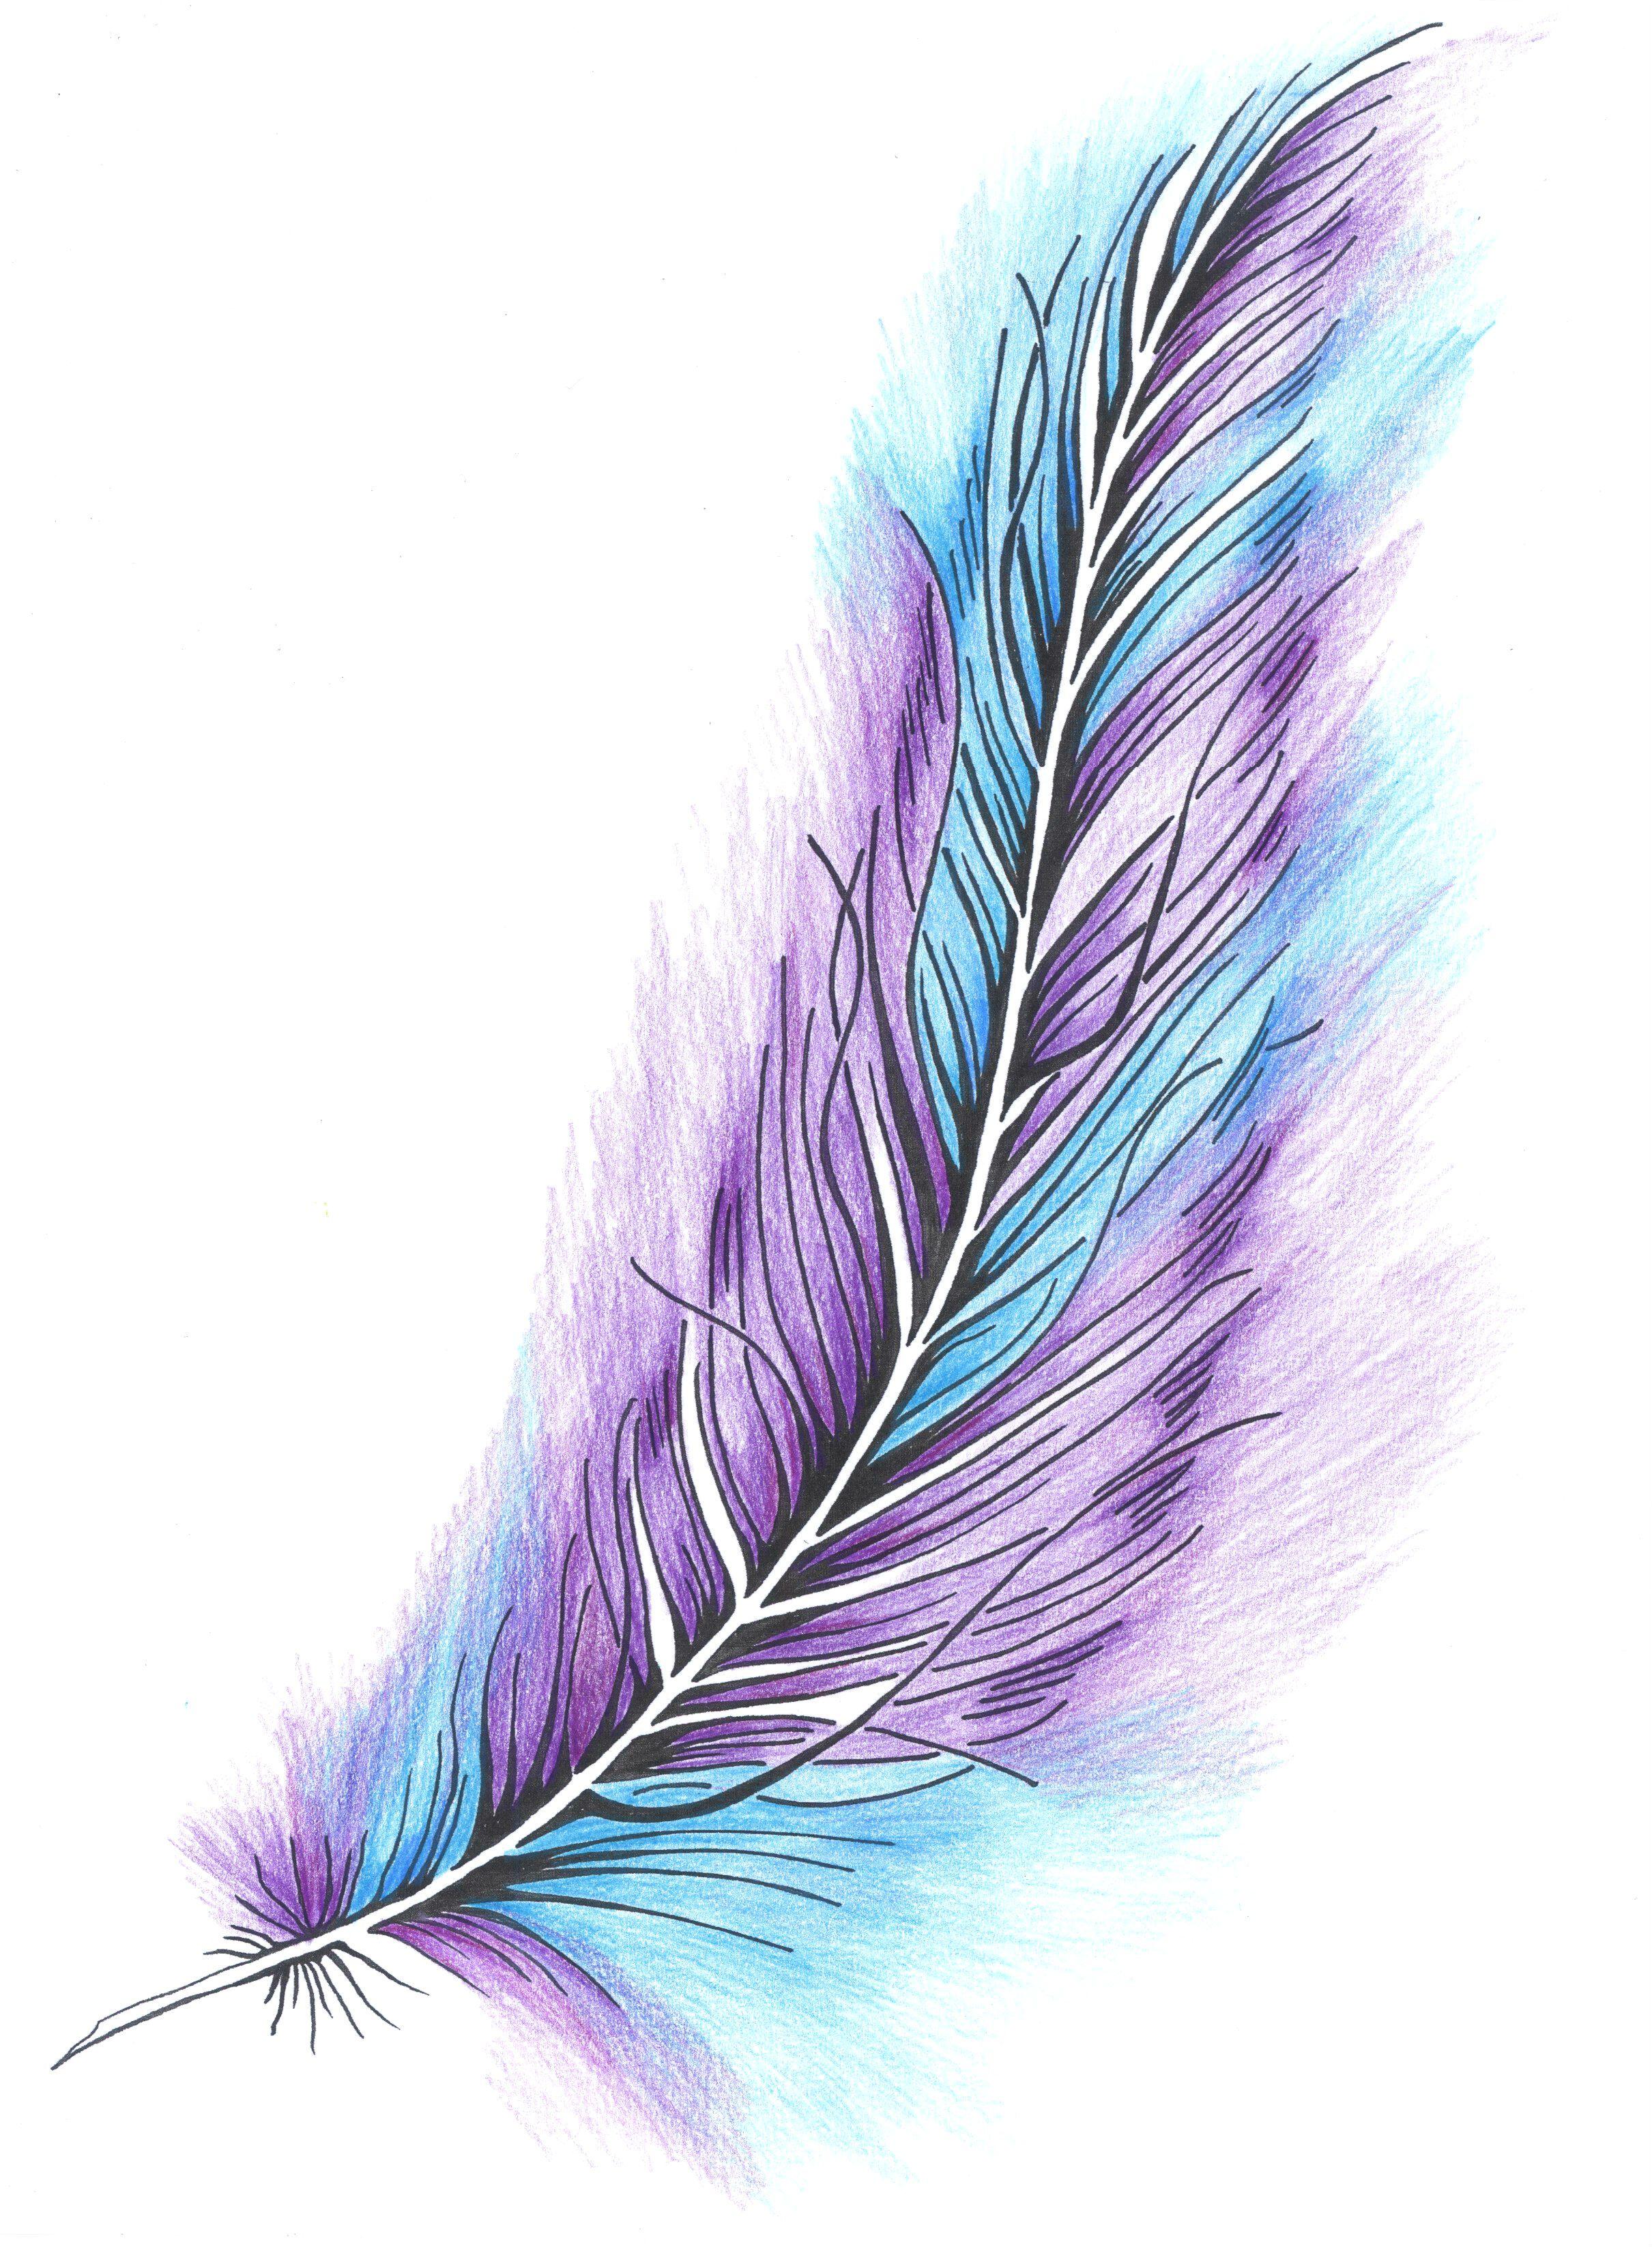 Original Tattoo Design Feather With Color Tattoo Ideas Tattoos